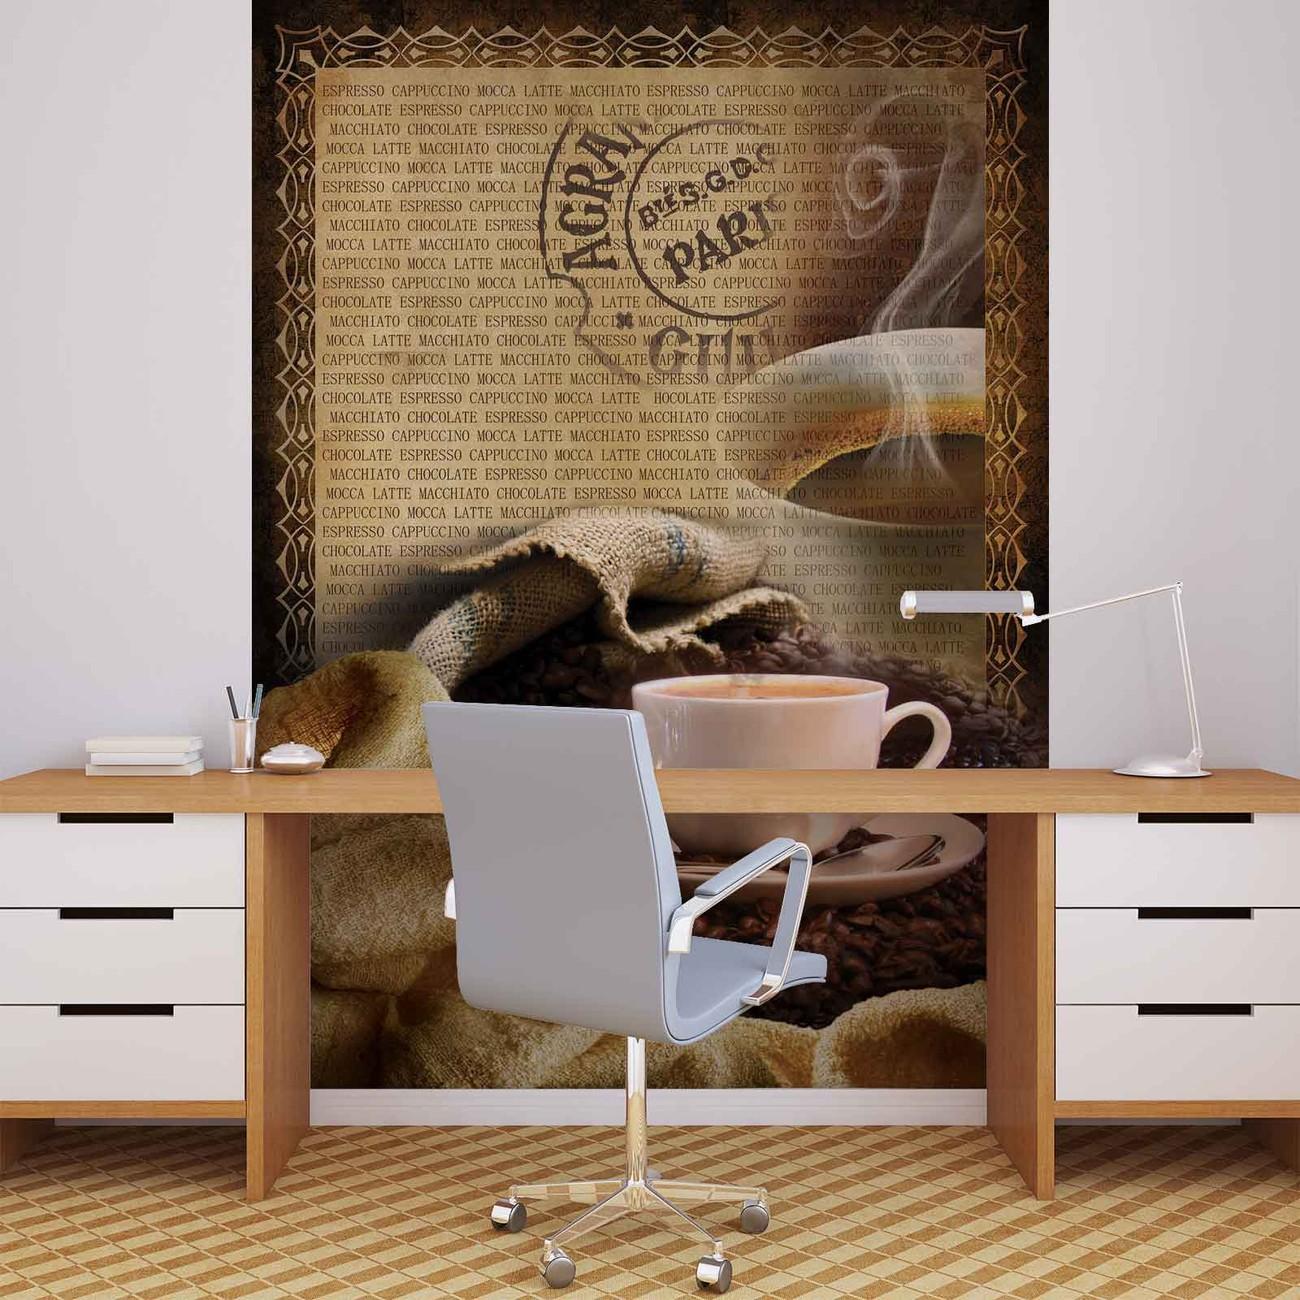 fototapete tapete kaffee bohnen bei europosters. Black Bedroom Furniture Sets. Home Design Ideas